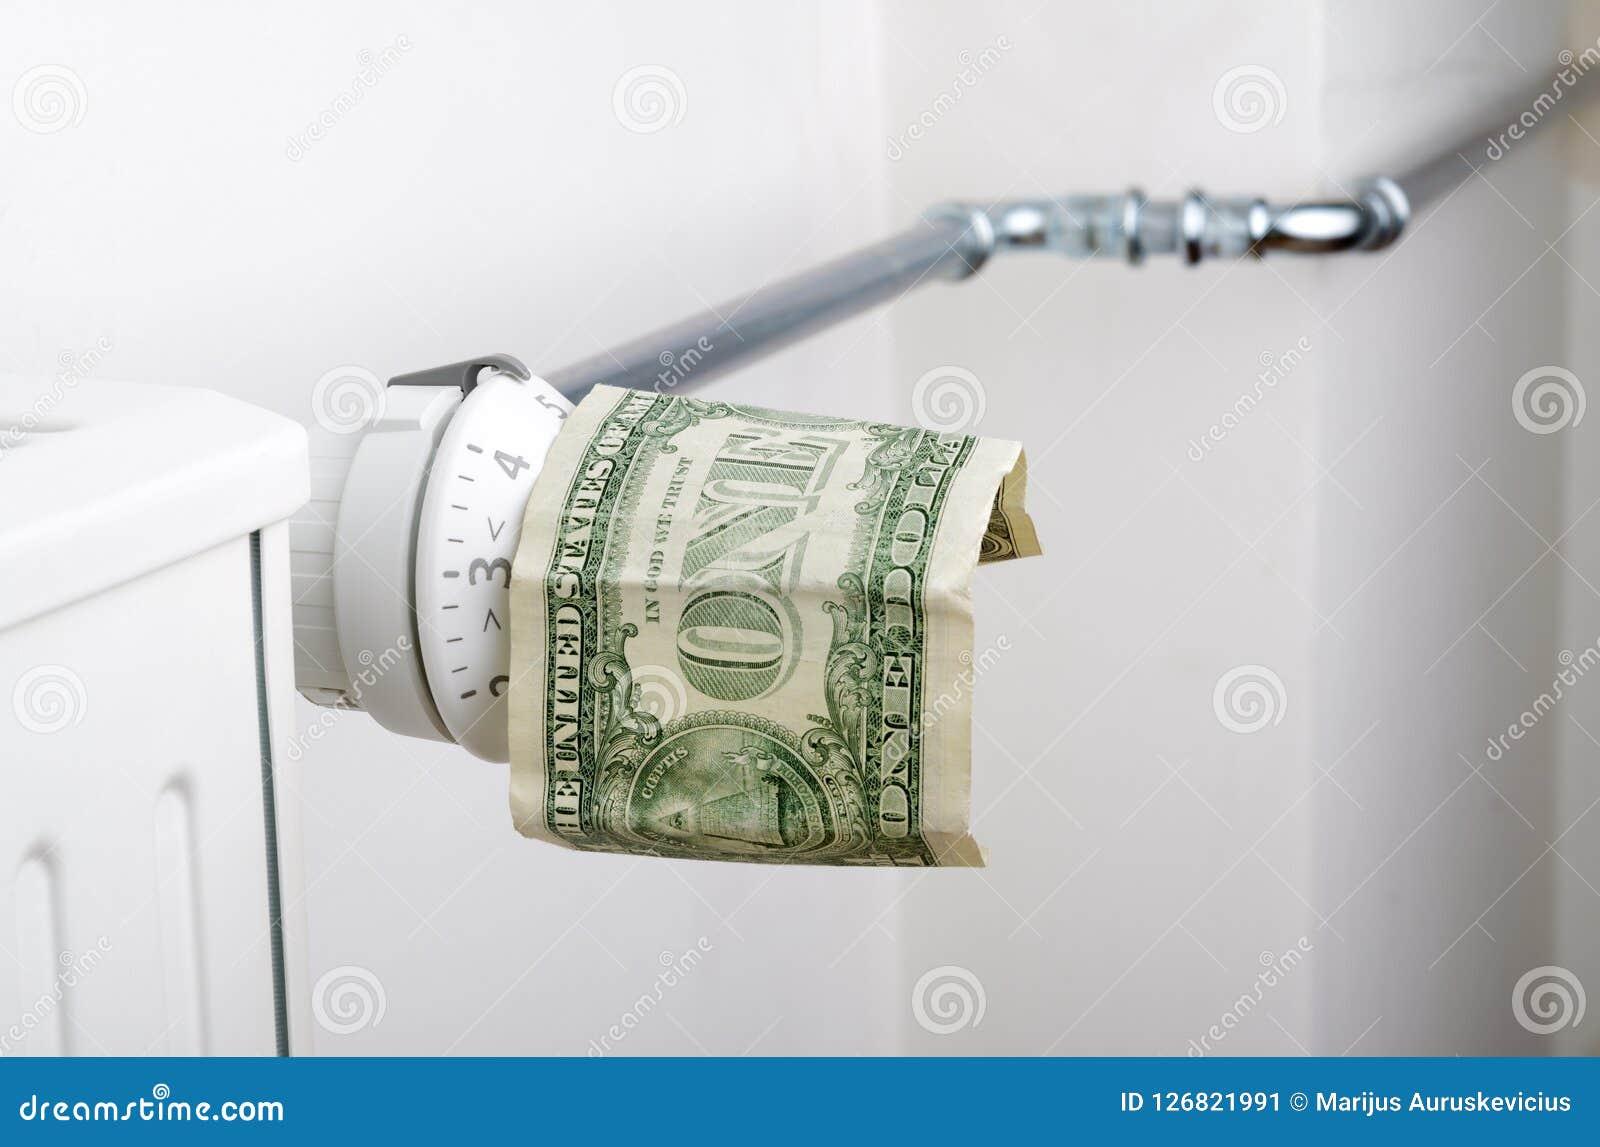 Radiator and one dollar. Money on heating battery. Heating season concept Stock Image